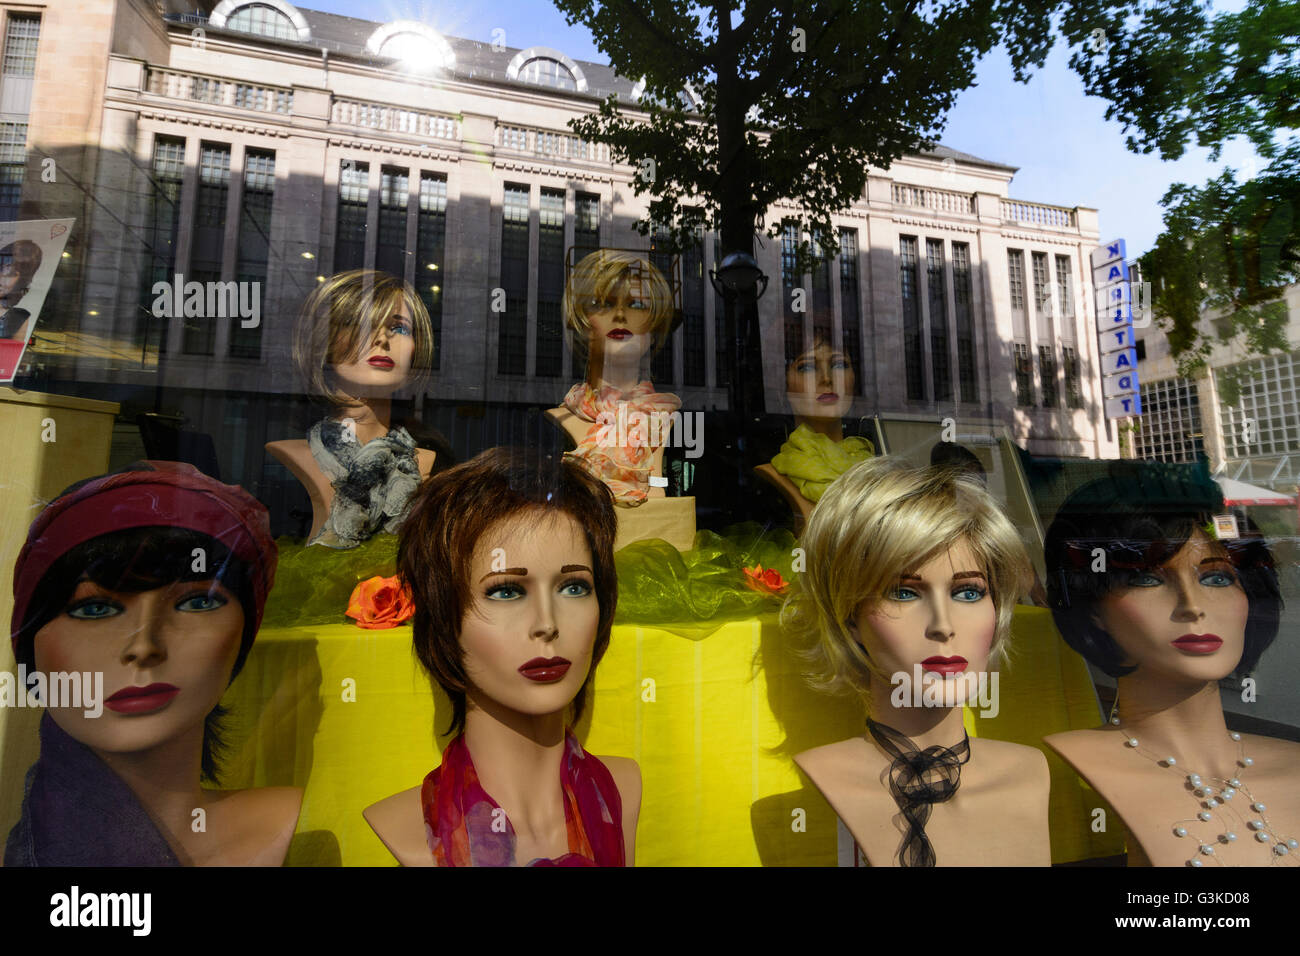 Perruques pour les femmes dans une vitrine, l'Allemagne, Baden-Württemberg, Karlsruhe, Kraichgau-Stromberg Photo Stock